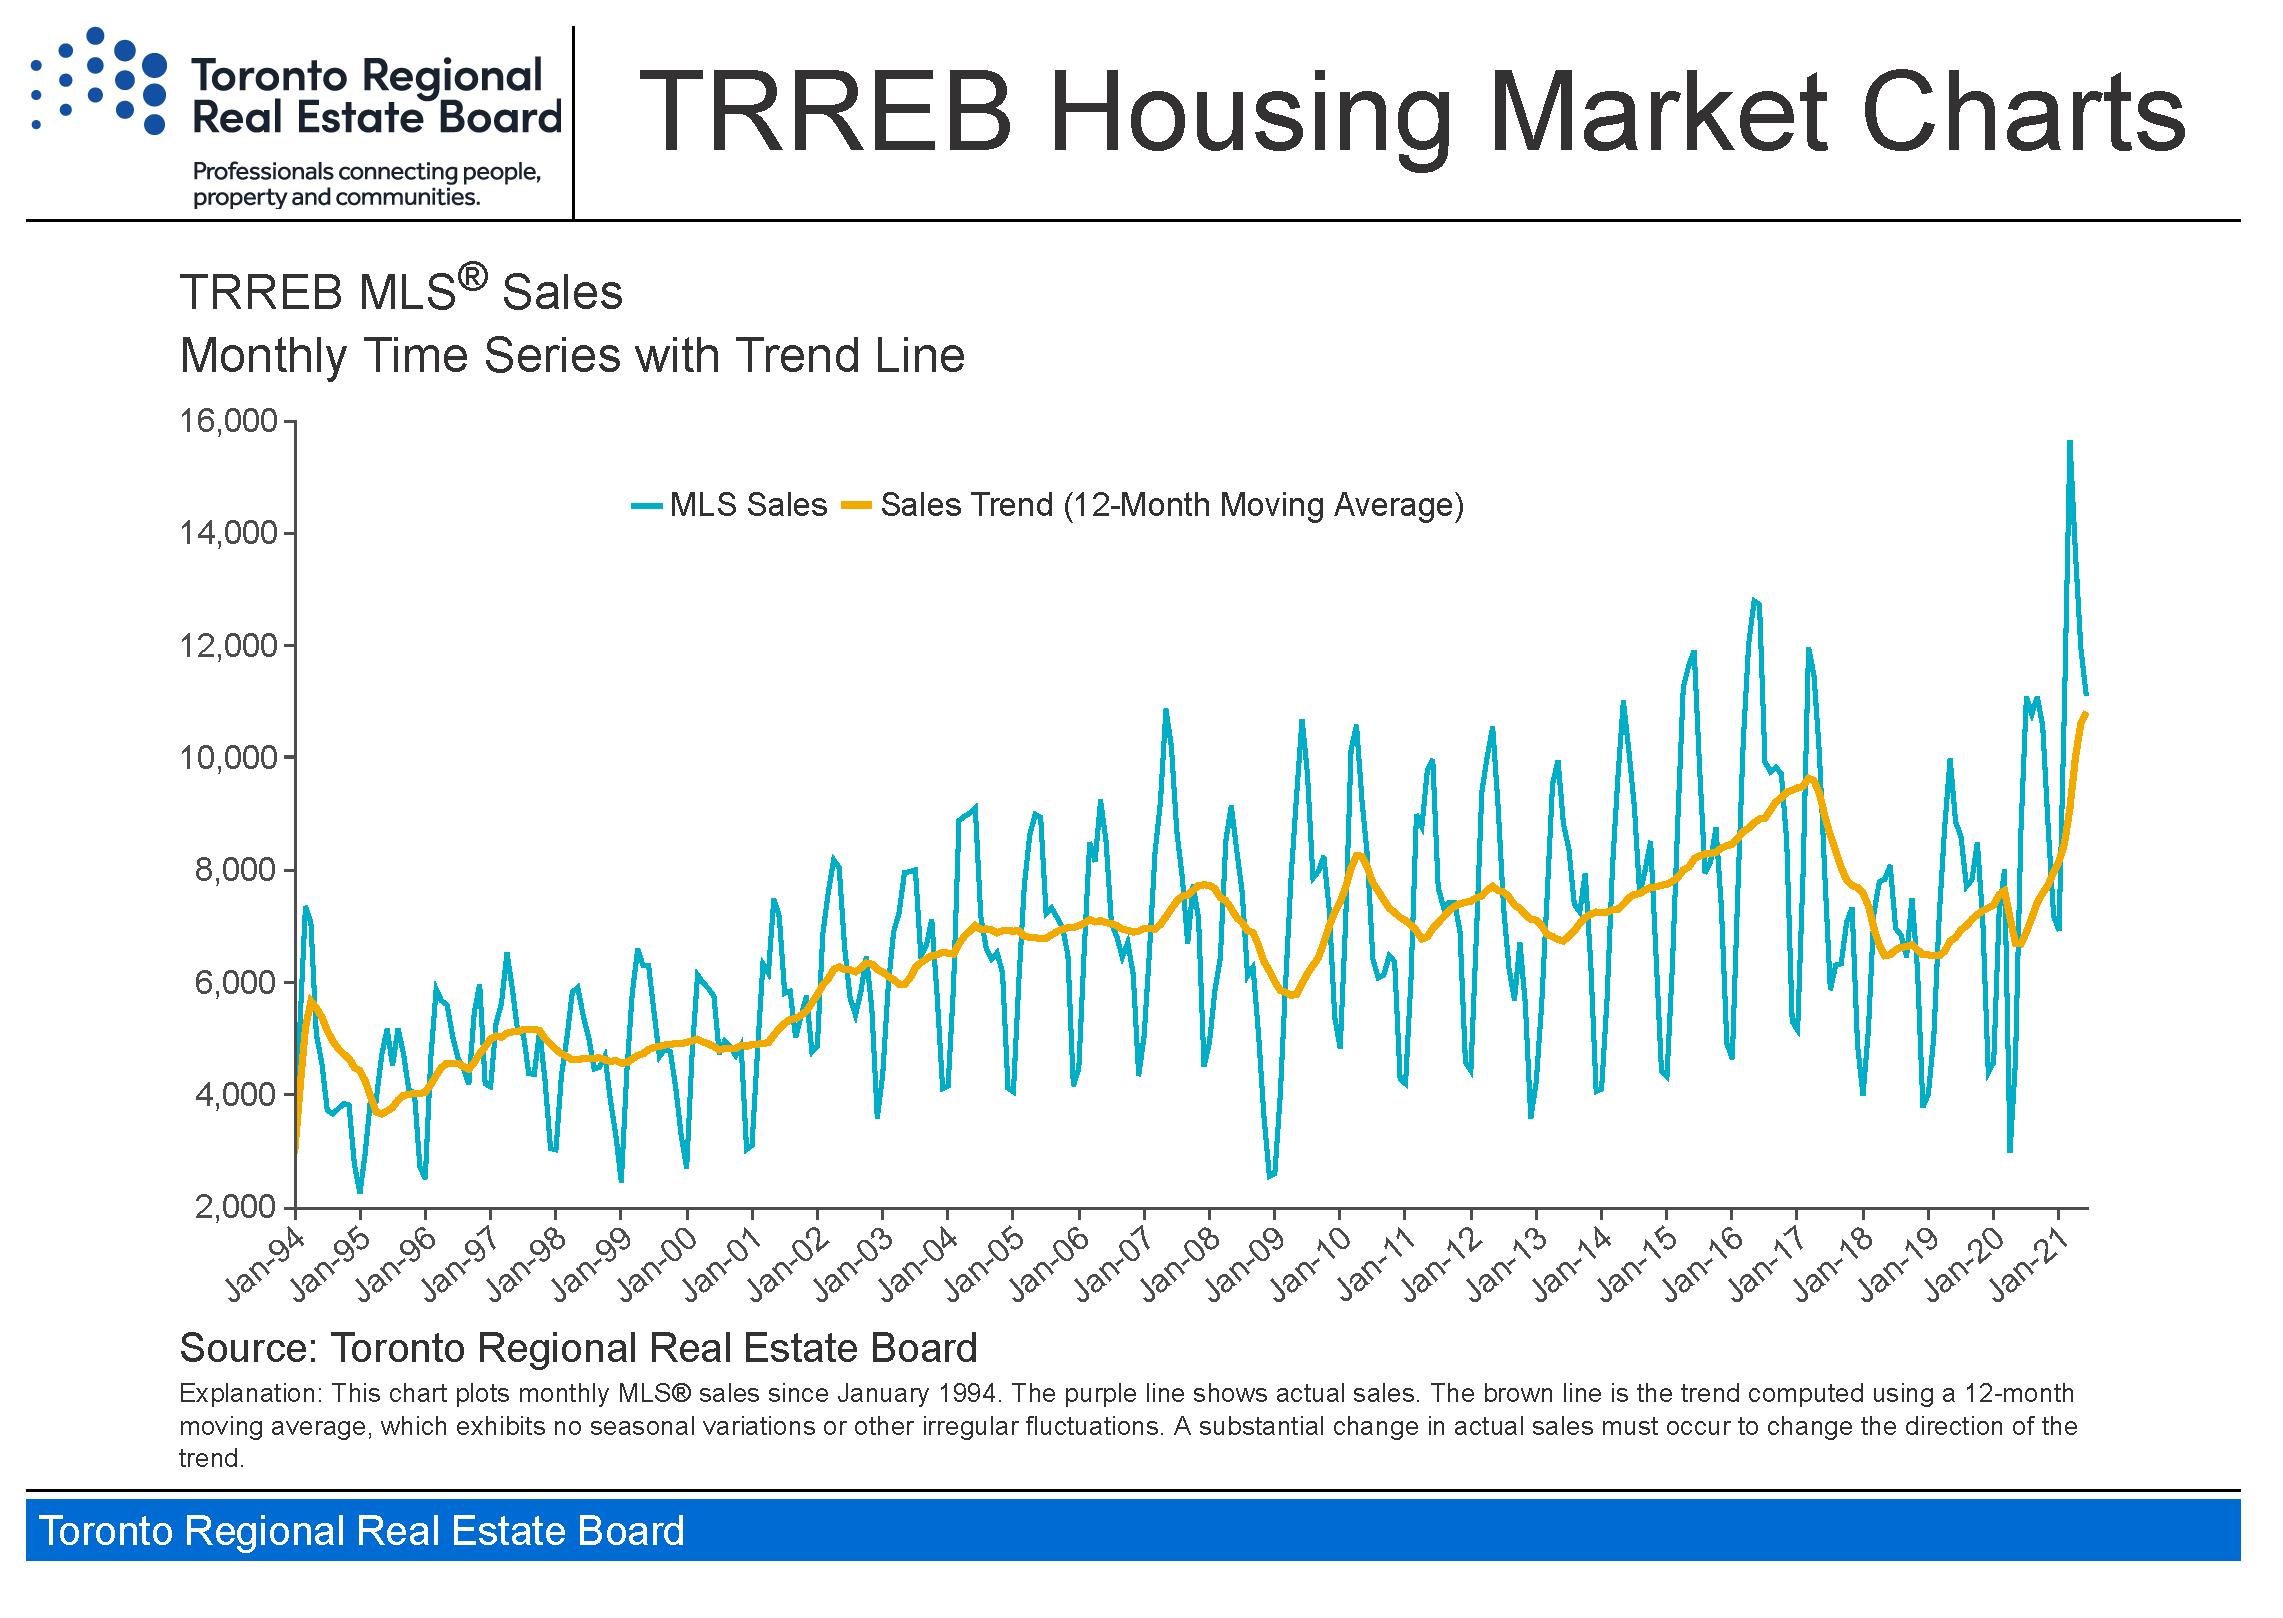 Toronto_housing-charts_TREB_Housing_Market_Charts-June_2021_Page_6